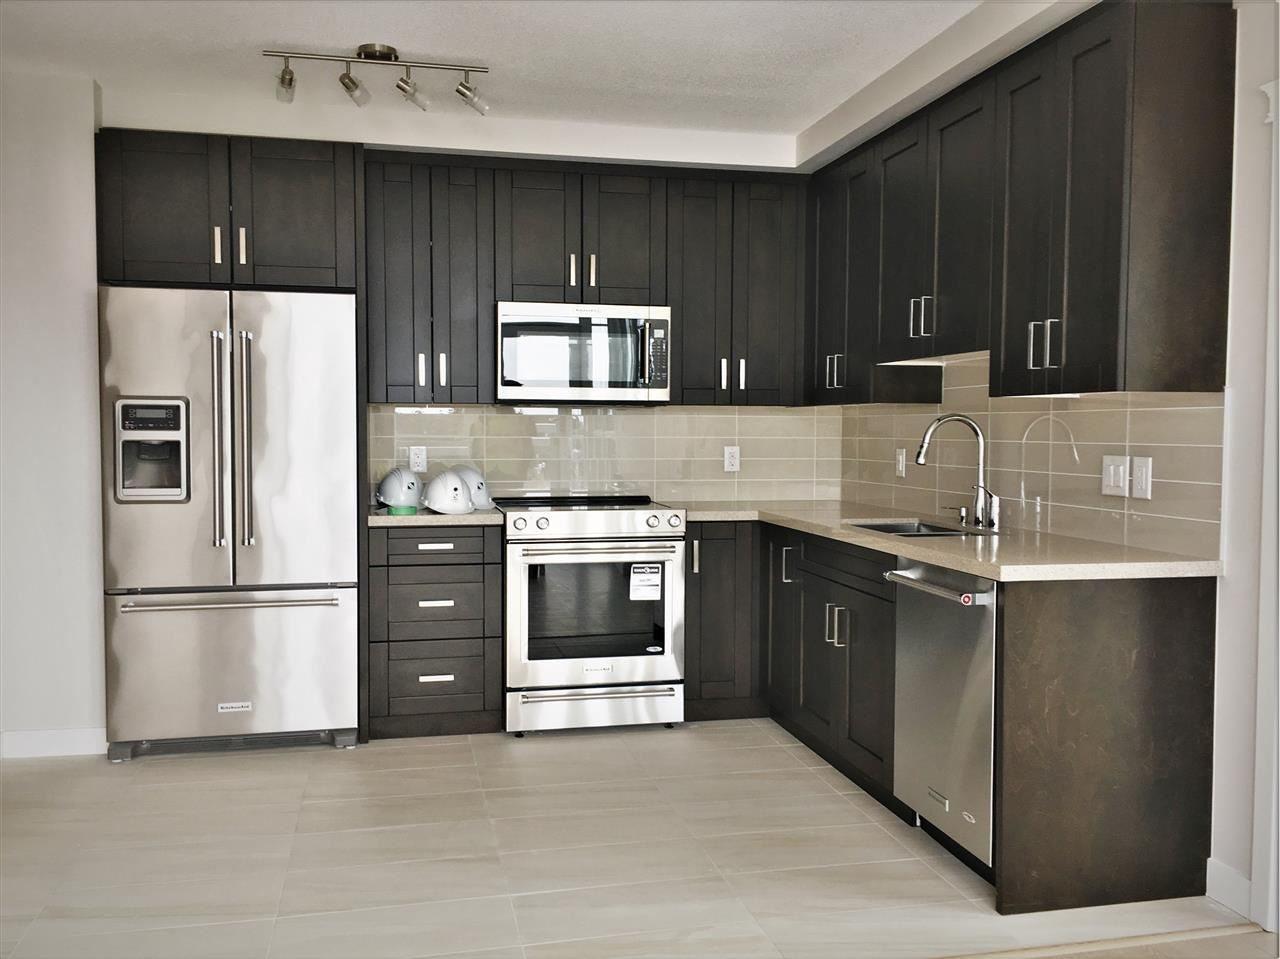 811 11967 80 AVENUE - Scottsdale Apartment/Condo for sale, 2 Bedrooms (R2555518) - #8